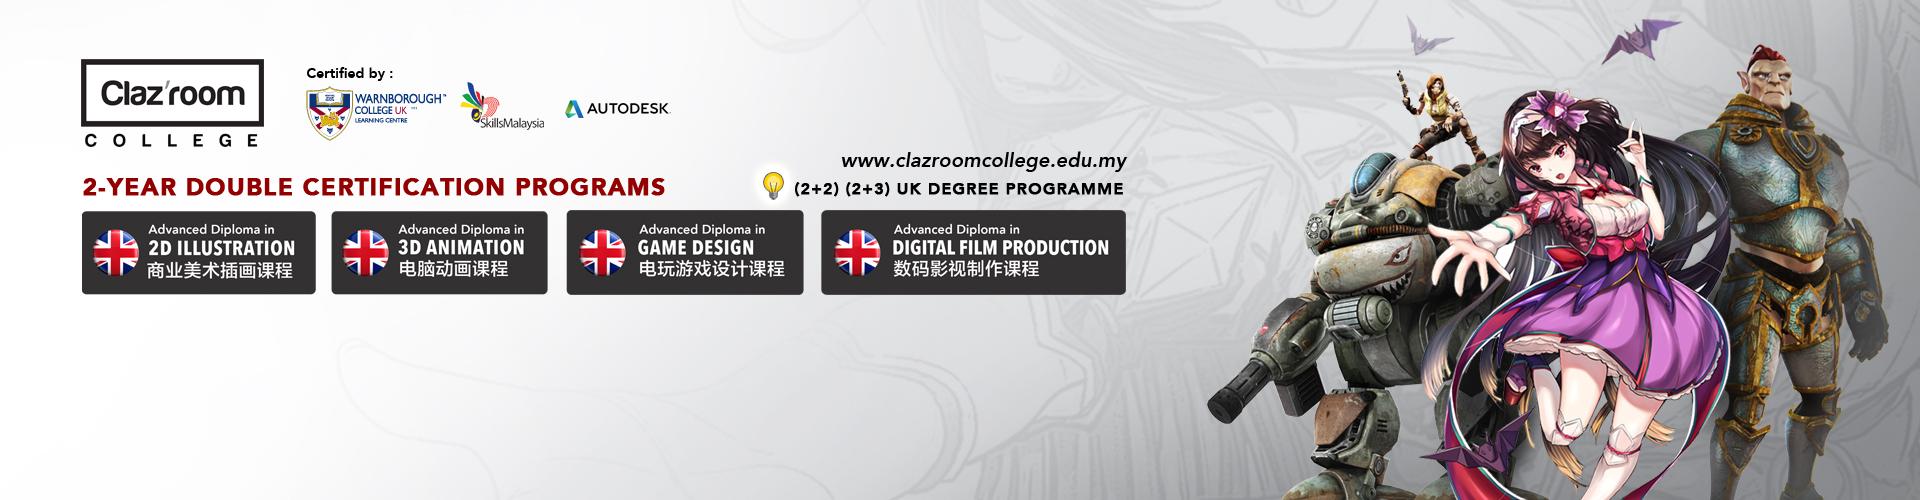 coursesmalaysia-clazroom-college-Leaderboard-Banner-2018